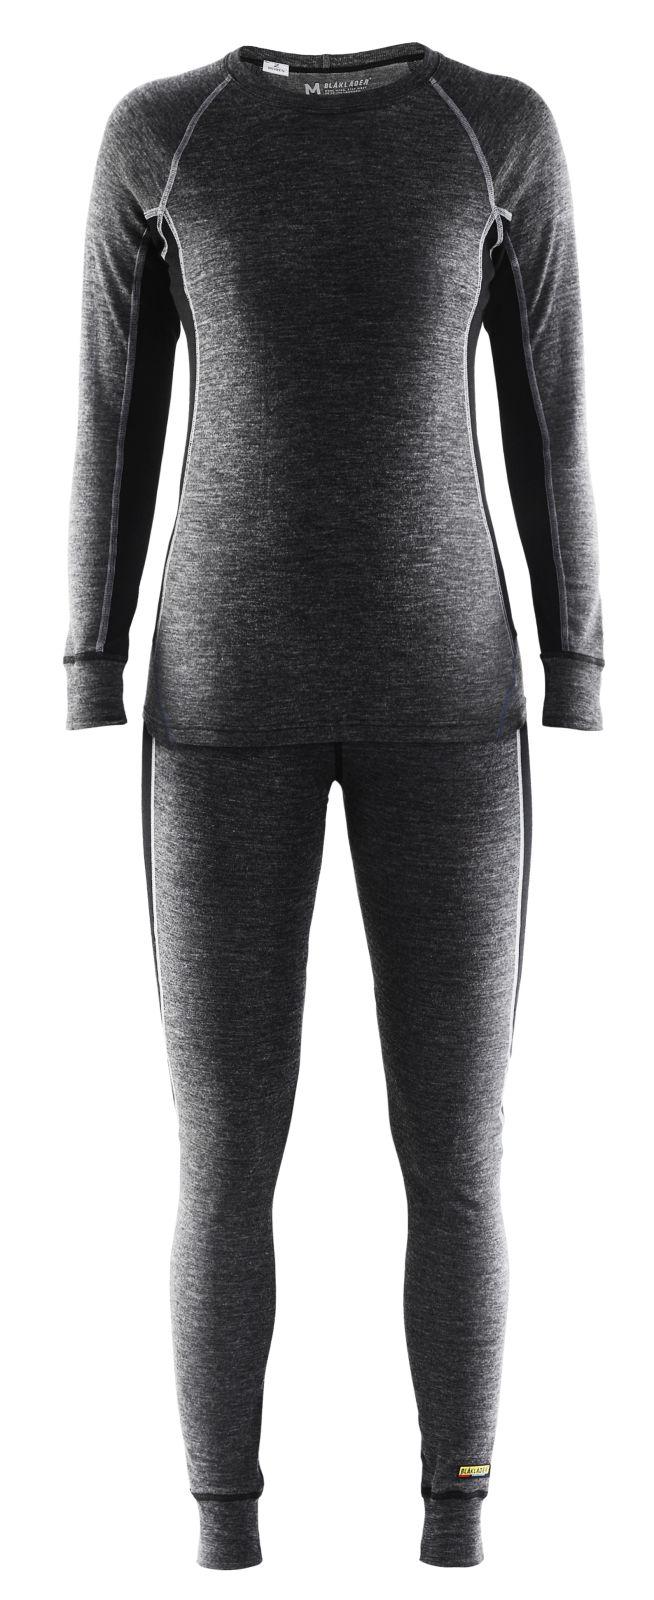 Blaklader Shirts 72001732 grijs-zwart(9699)